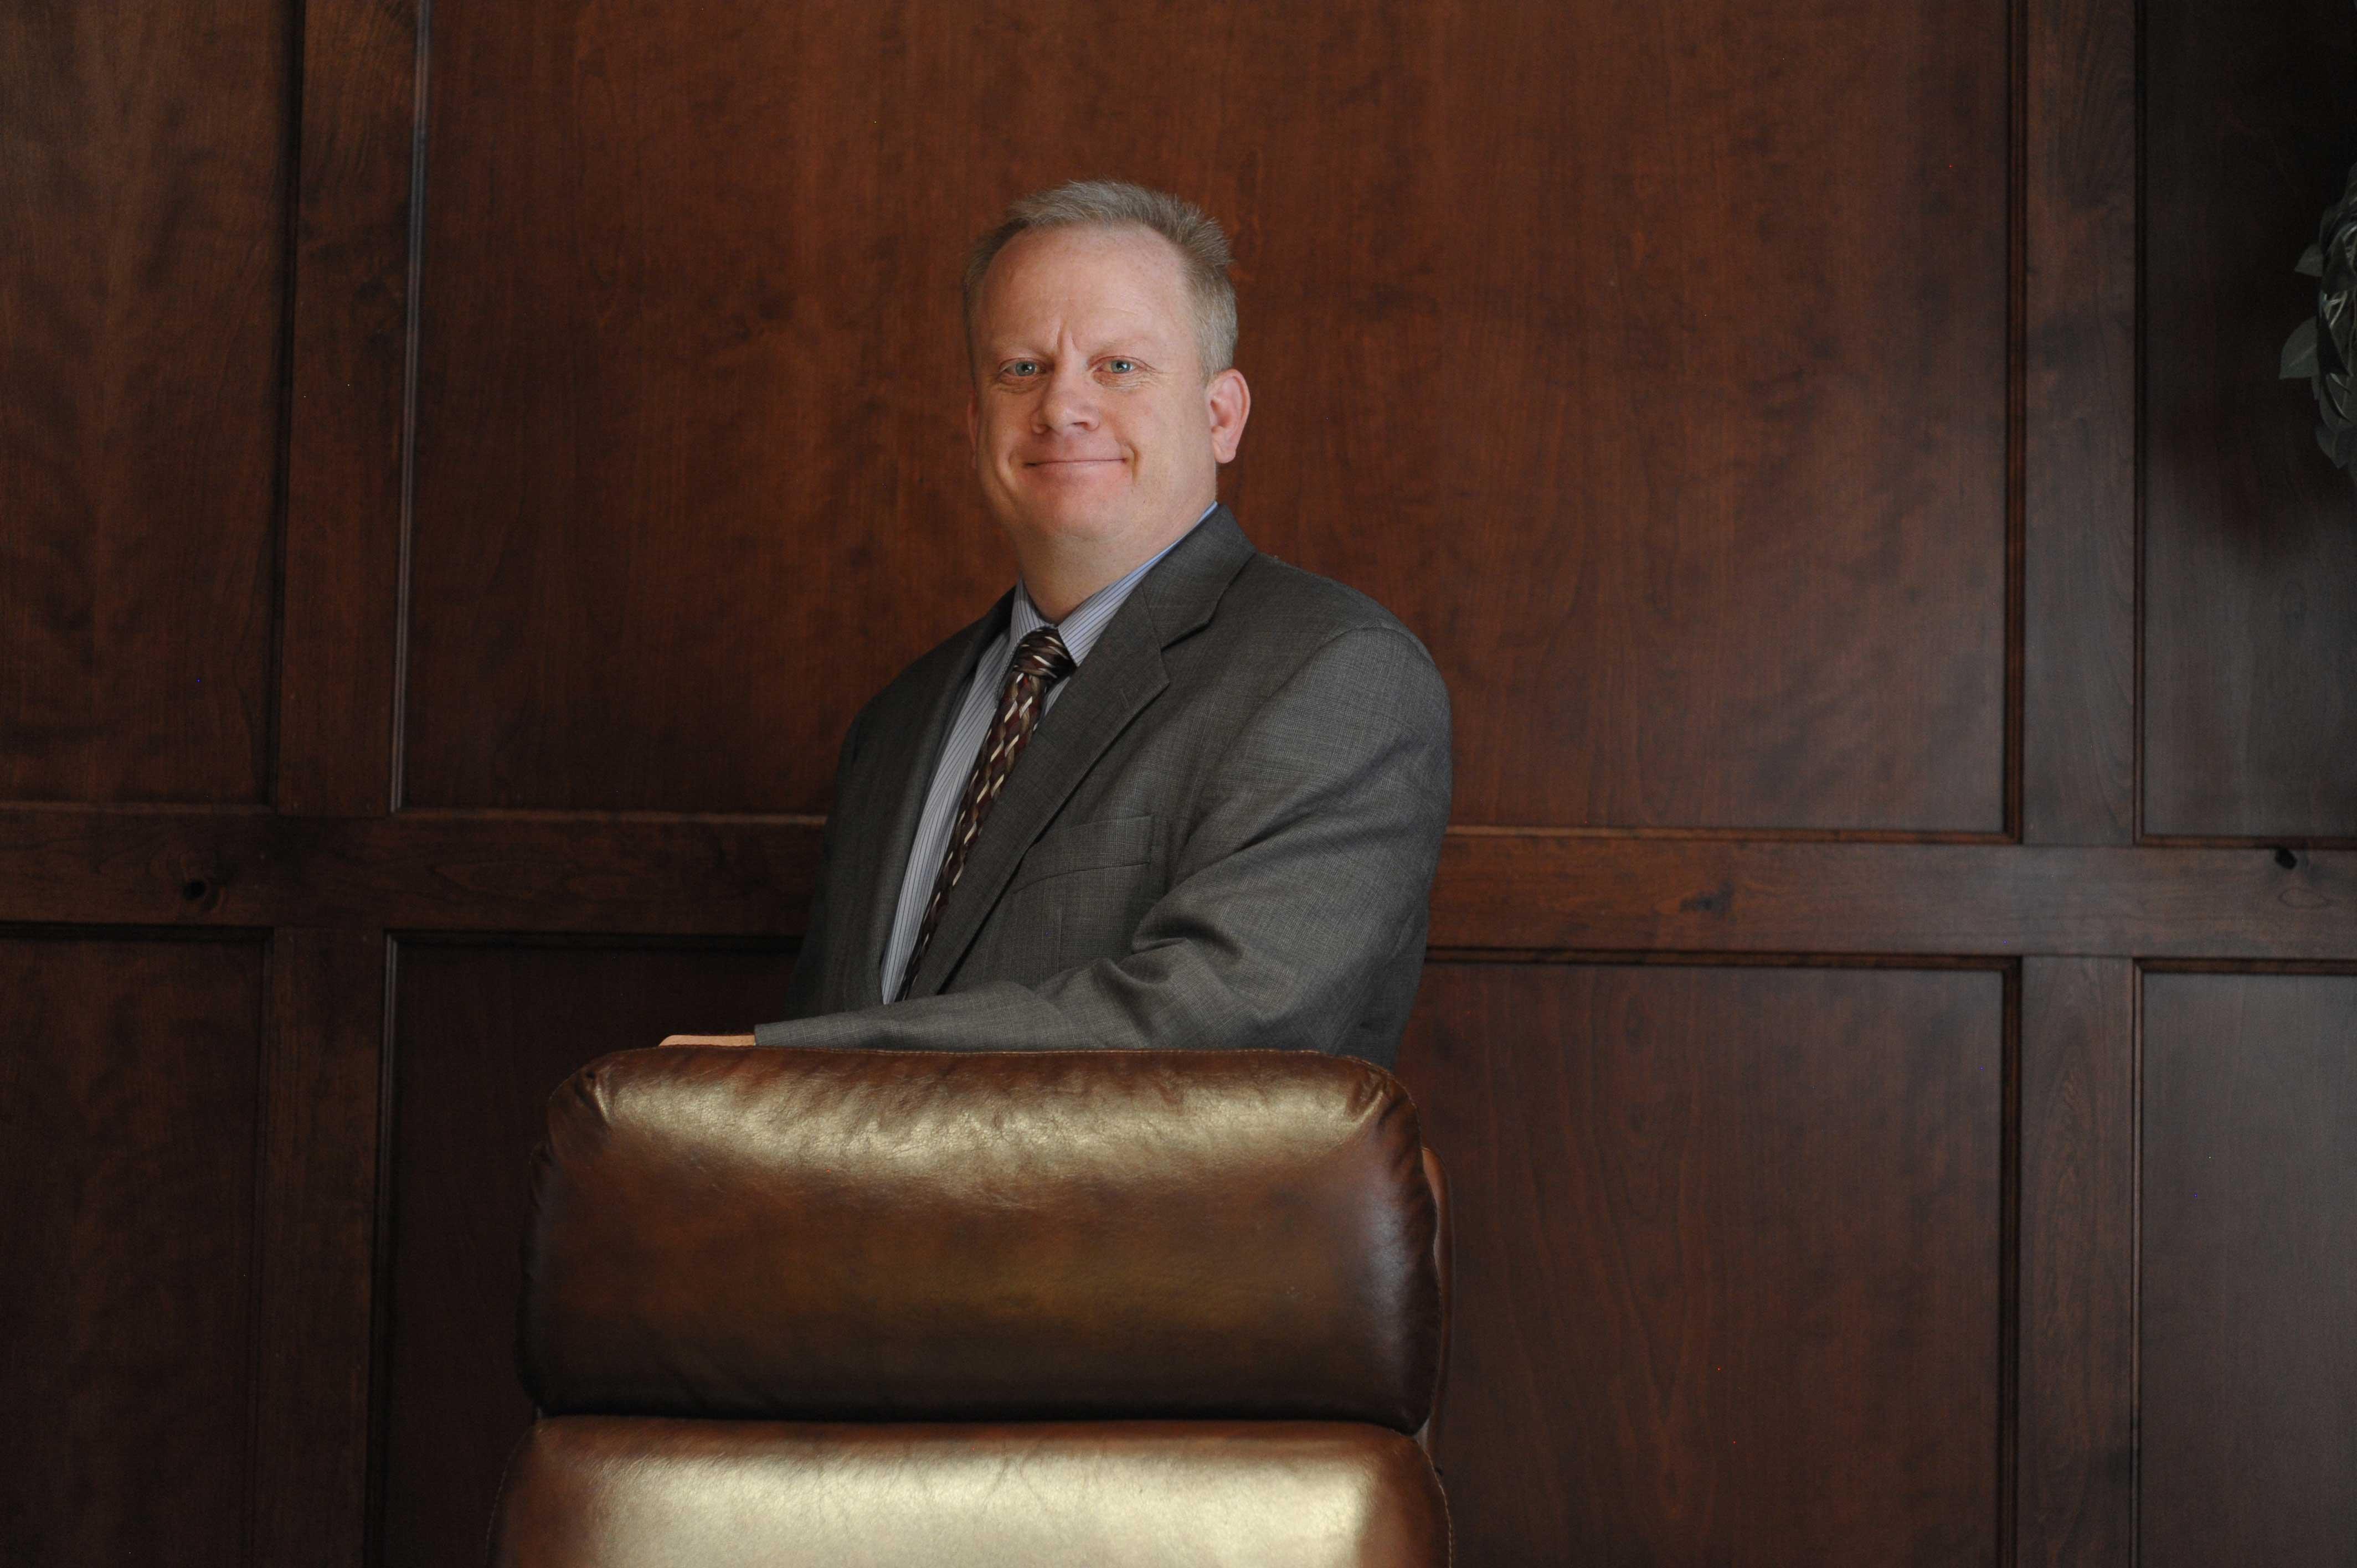 Jason White, Attorney at Law, PLLC